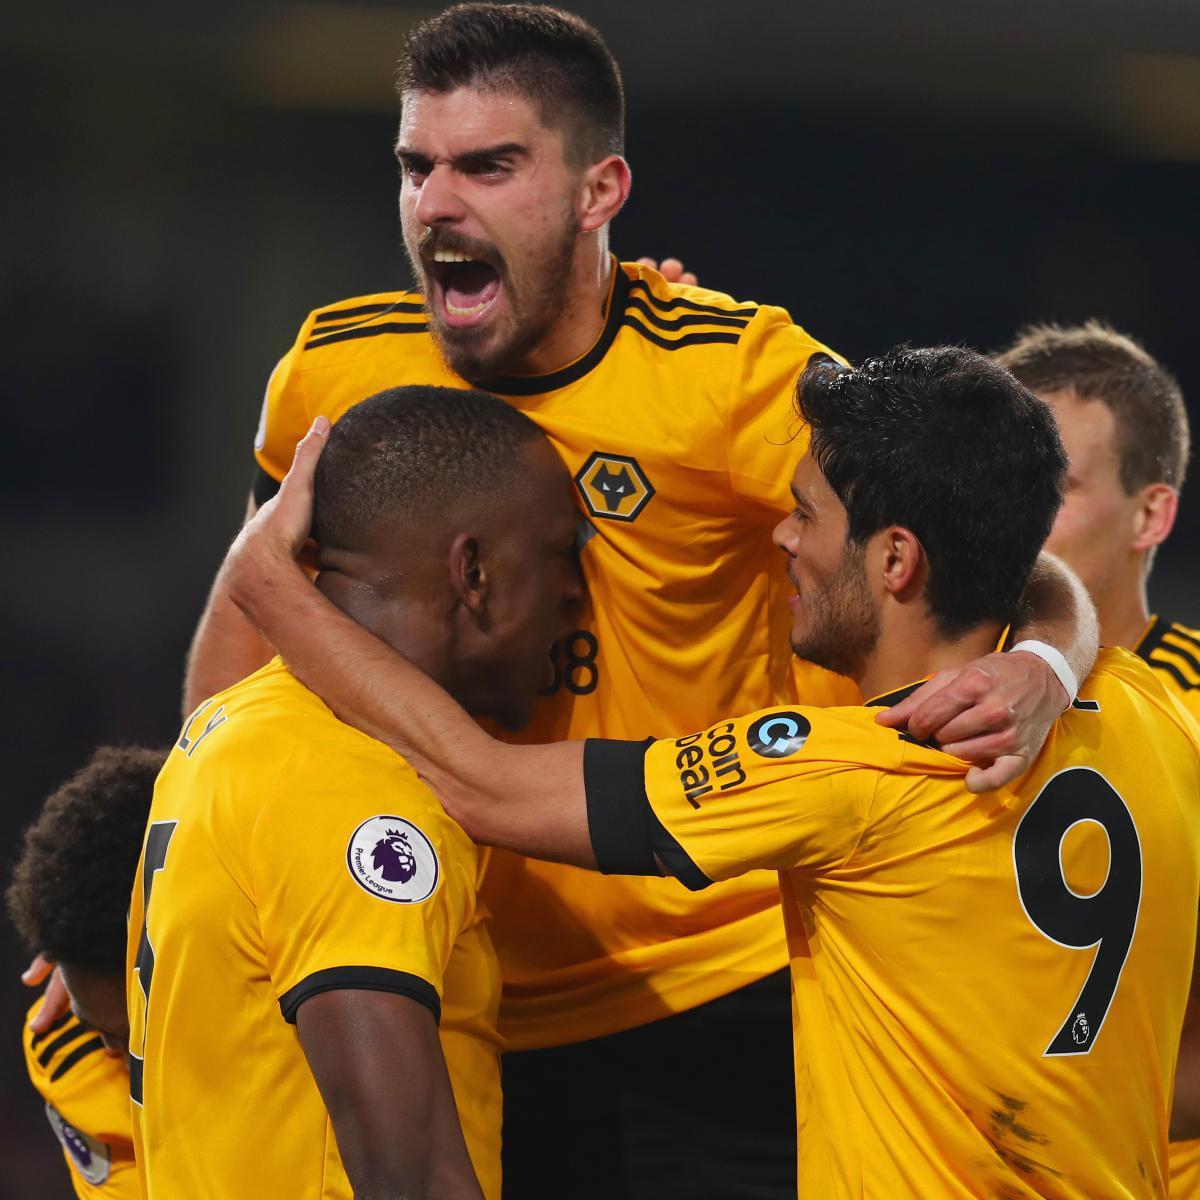 Manchester United 3 1 Huddersfield Result: Premier League Table: 2019 Standings, Week 27 Fixtures